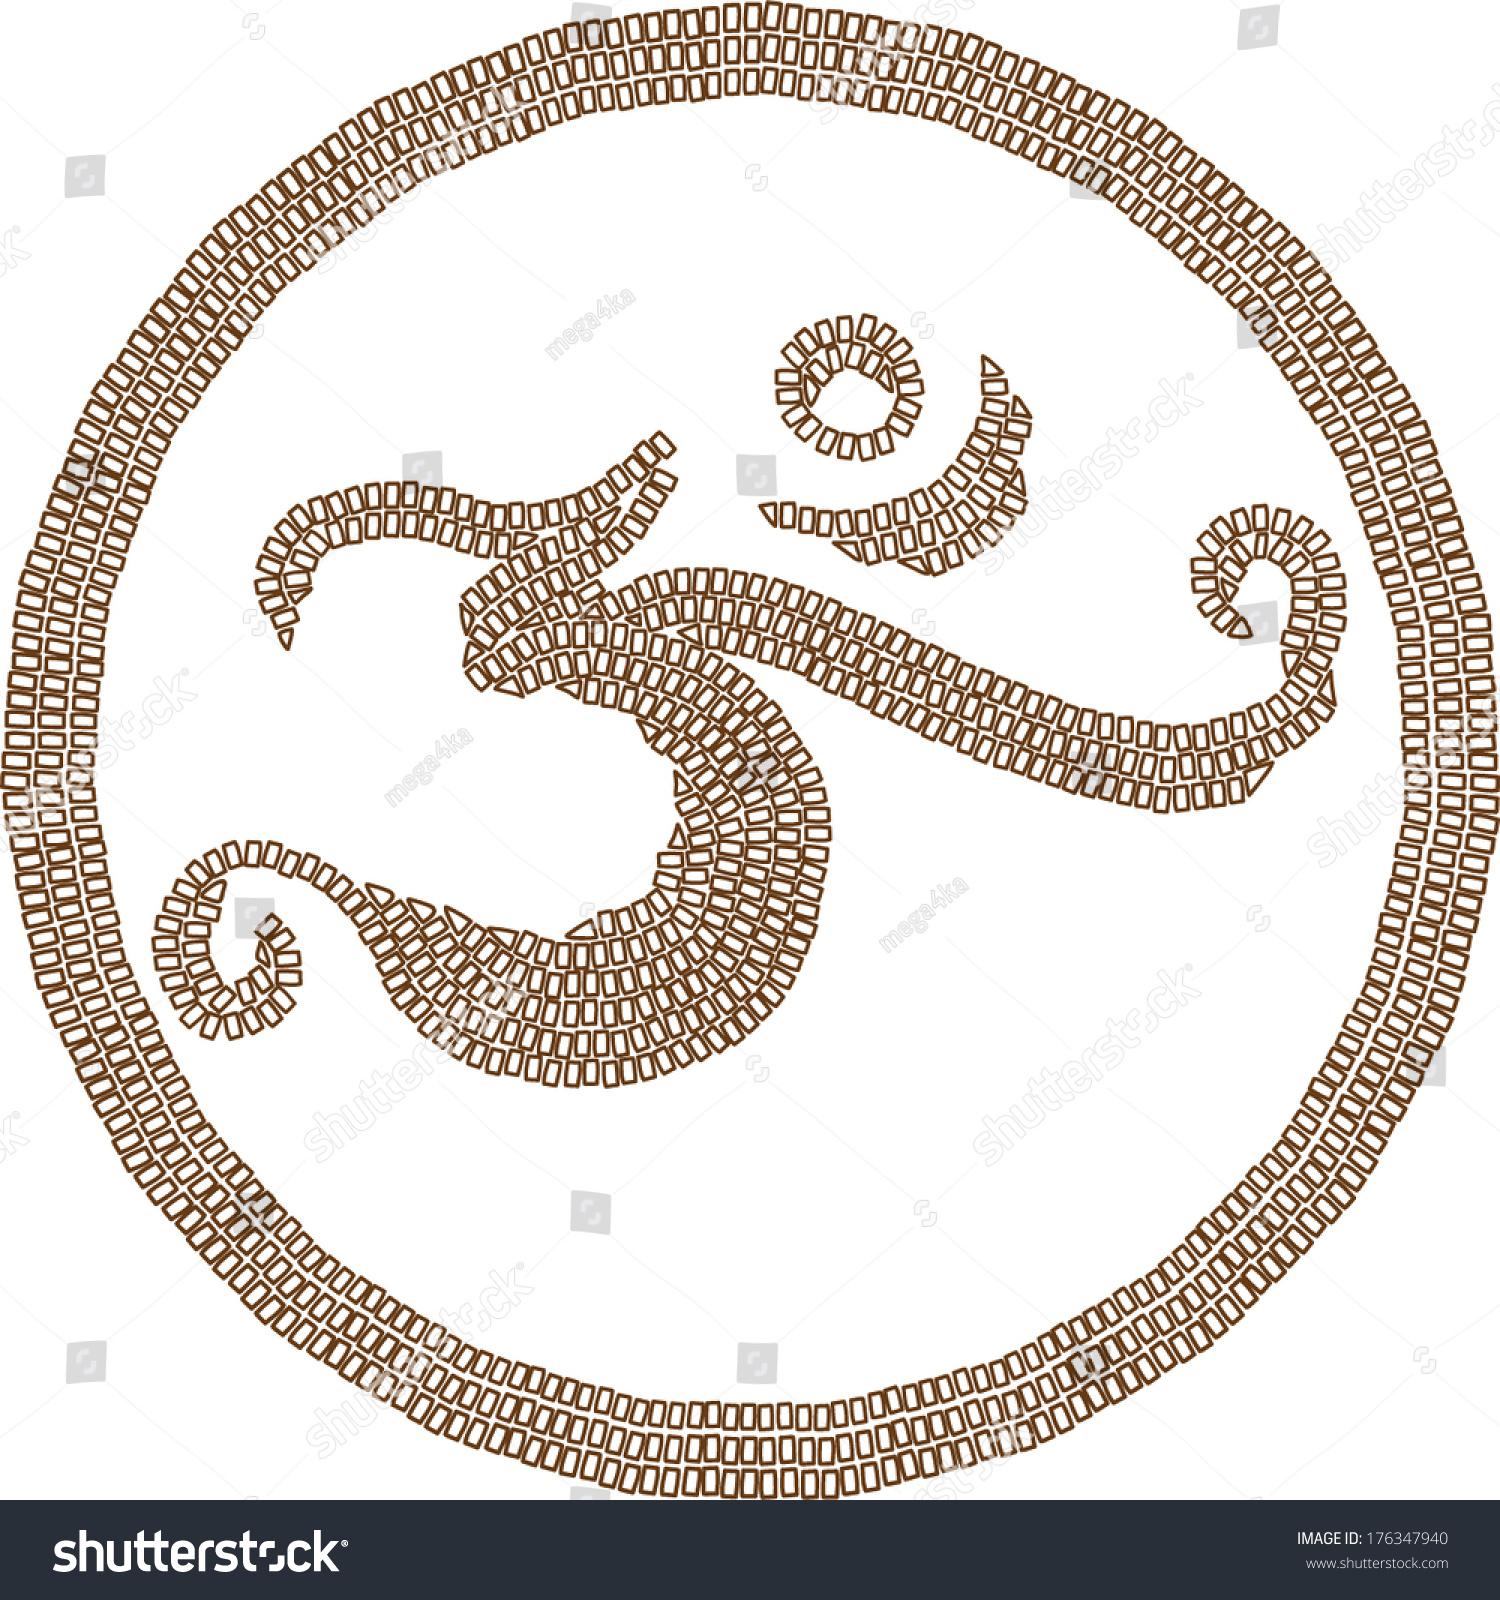 Hinduism religion symbol om created mosaic stock vector 176347940 hinduism religion symbol om created in mosaic style on white background buycottarizona Image collections